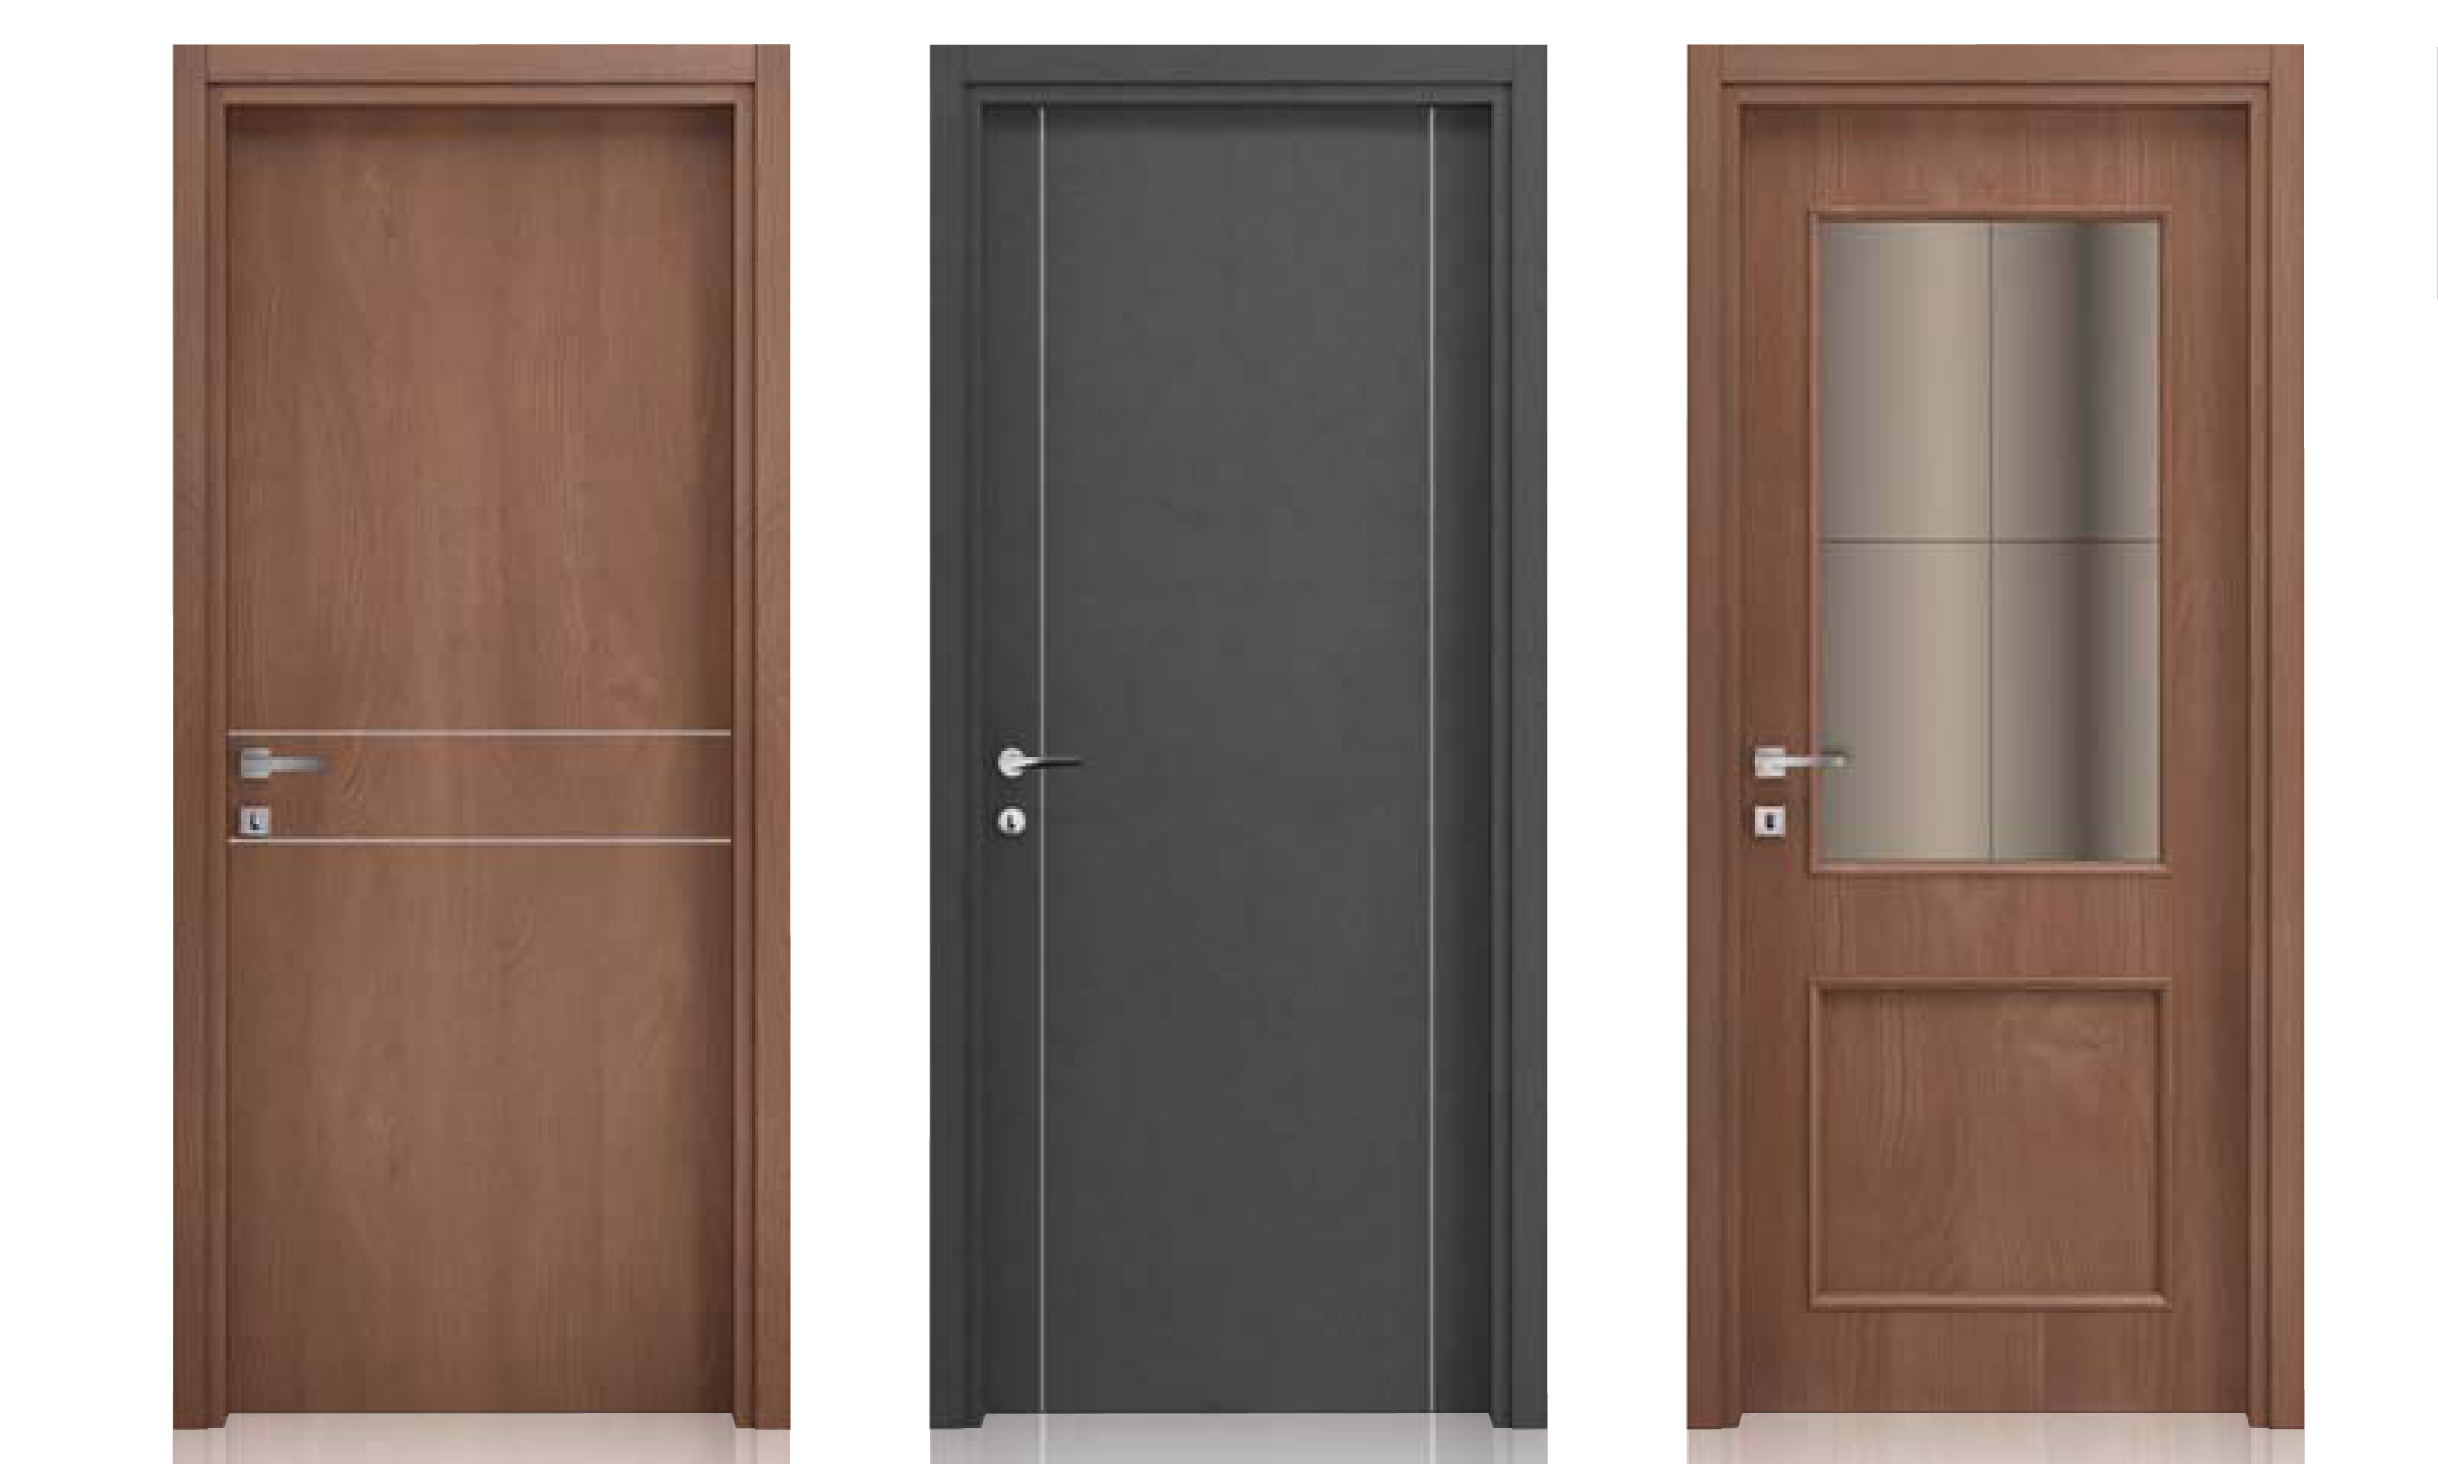 Porte in laminato casa infissi debernardis altamura bari - Porte interne rovere grigio ...